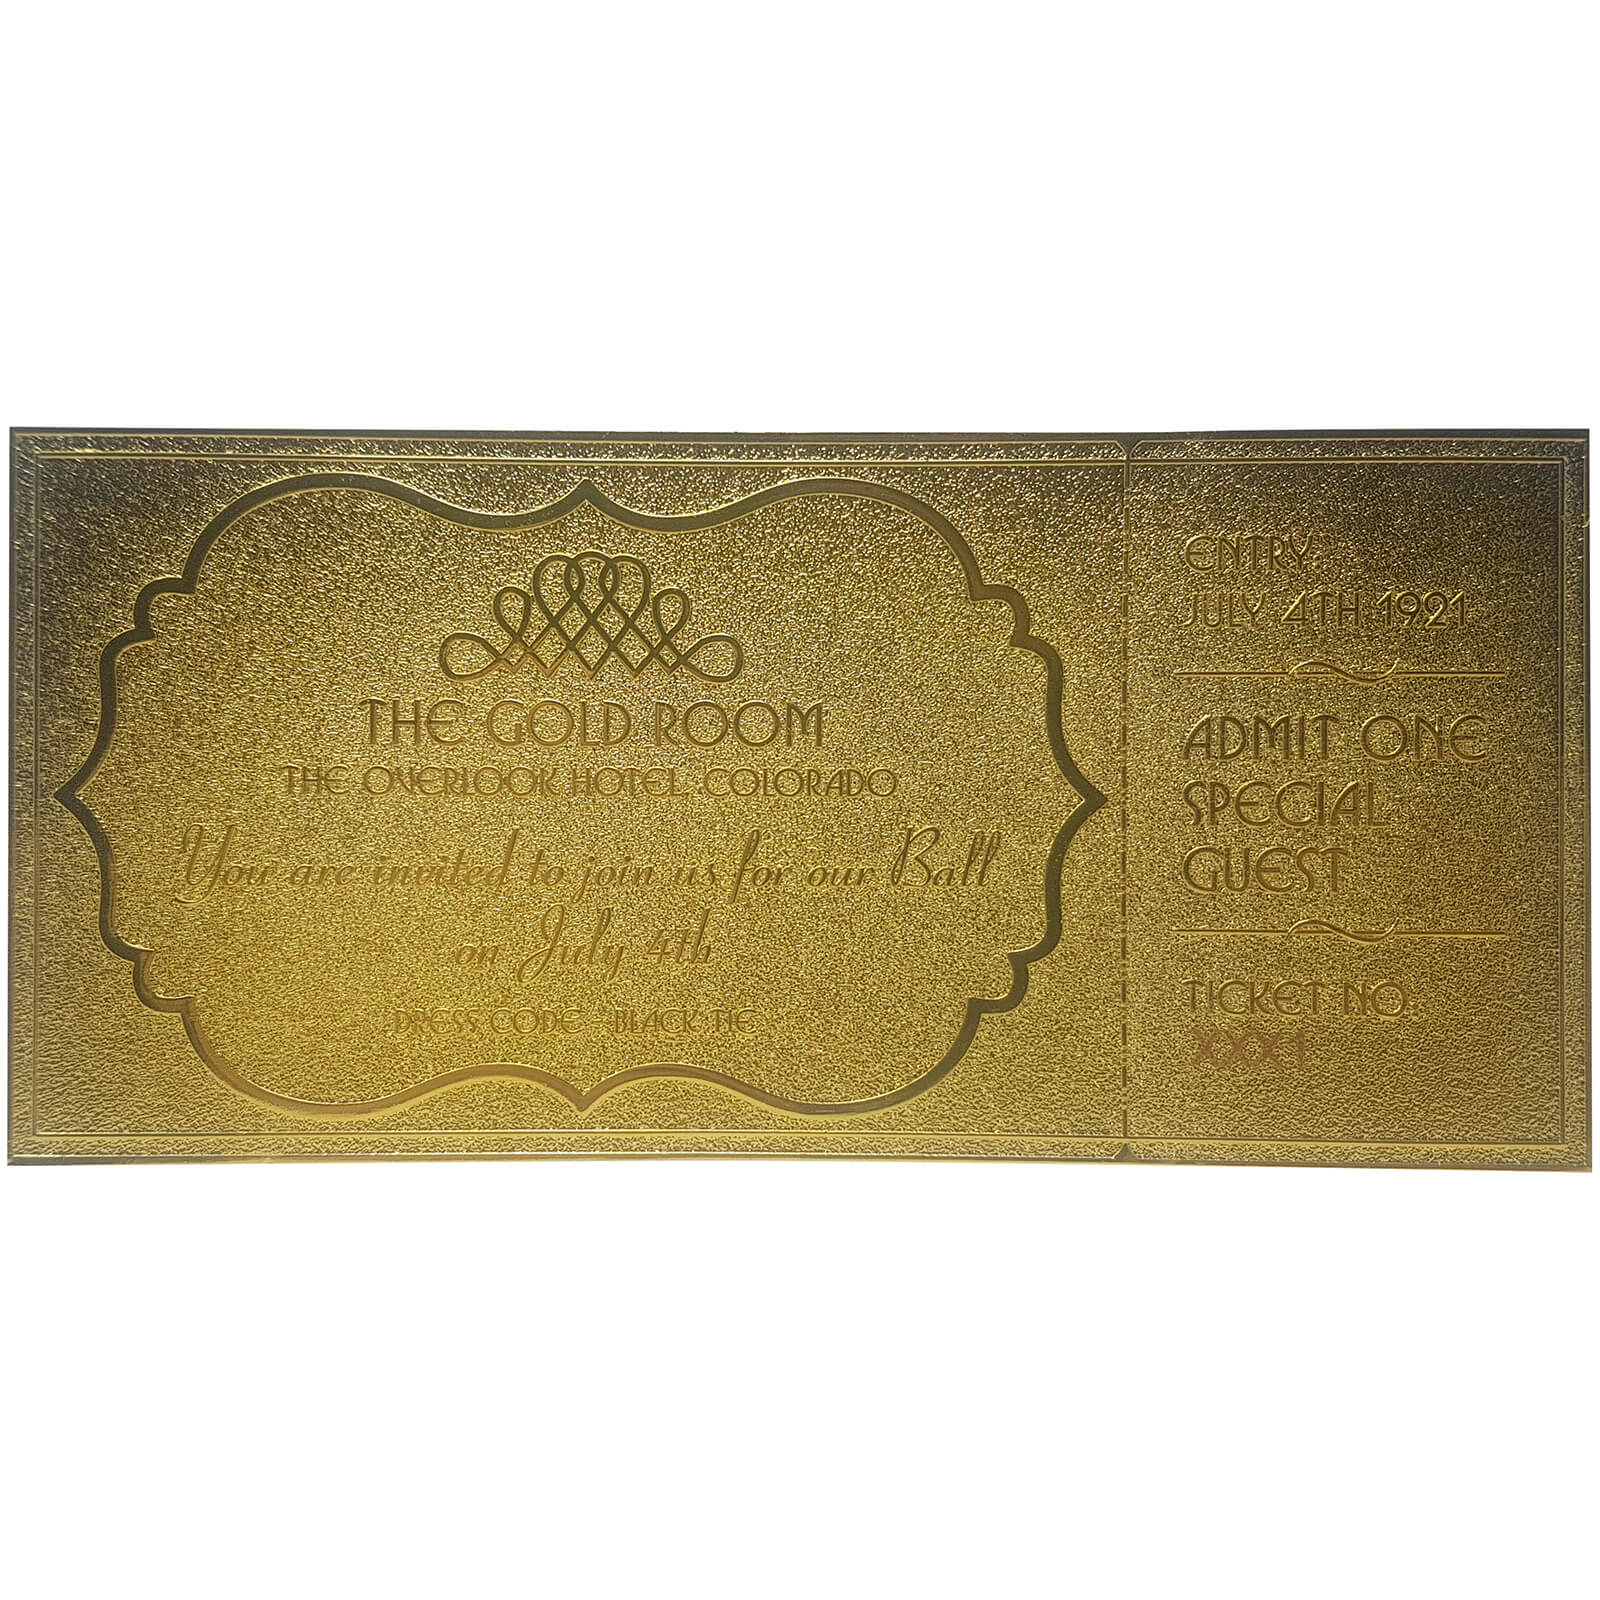 The shining ballroom ticket